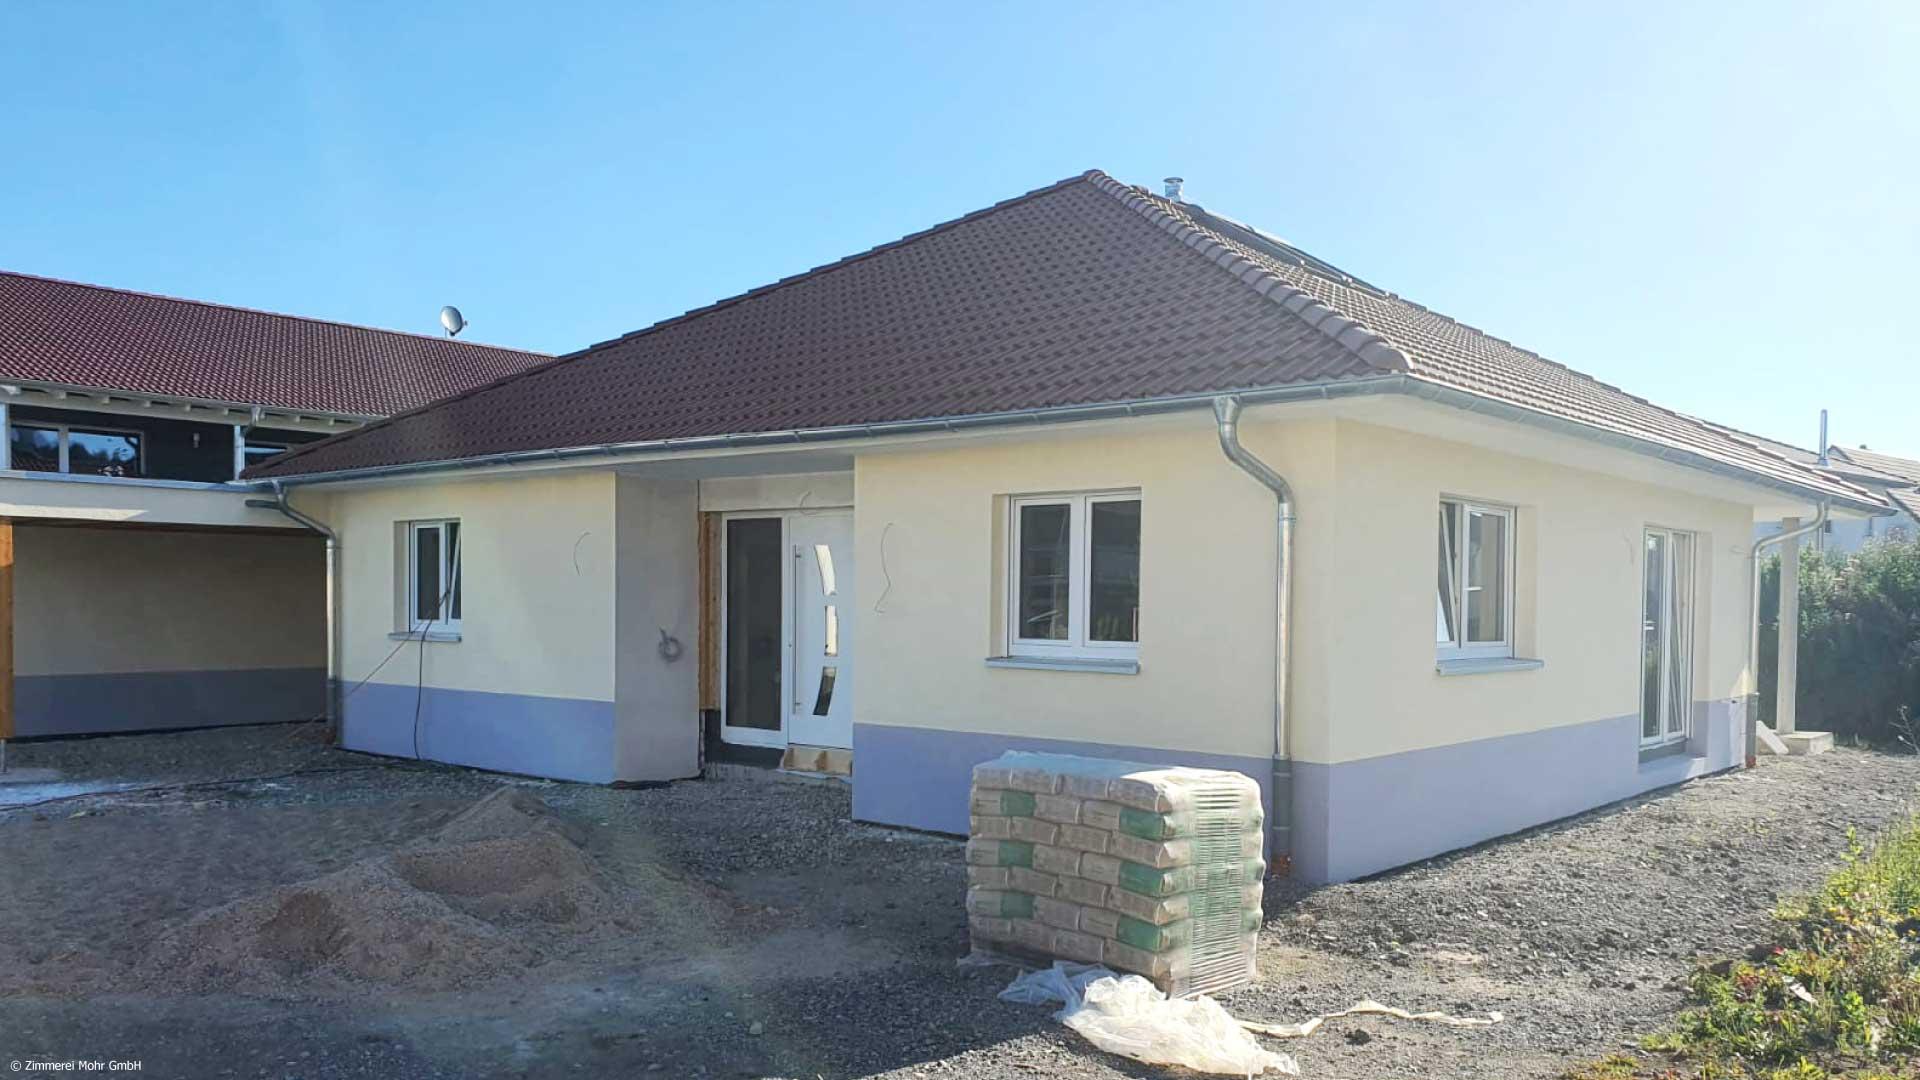 Bungalow SUNNY - Neubau Holzhaus mit Walmdach